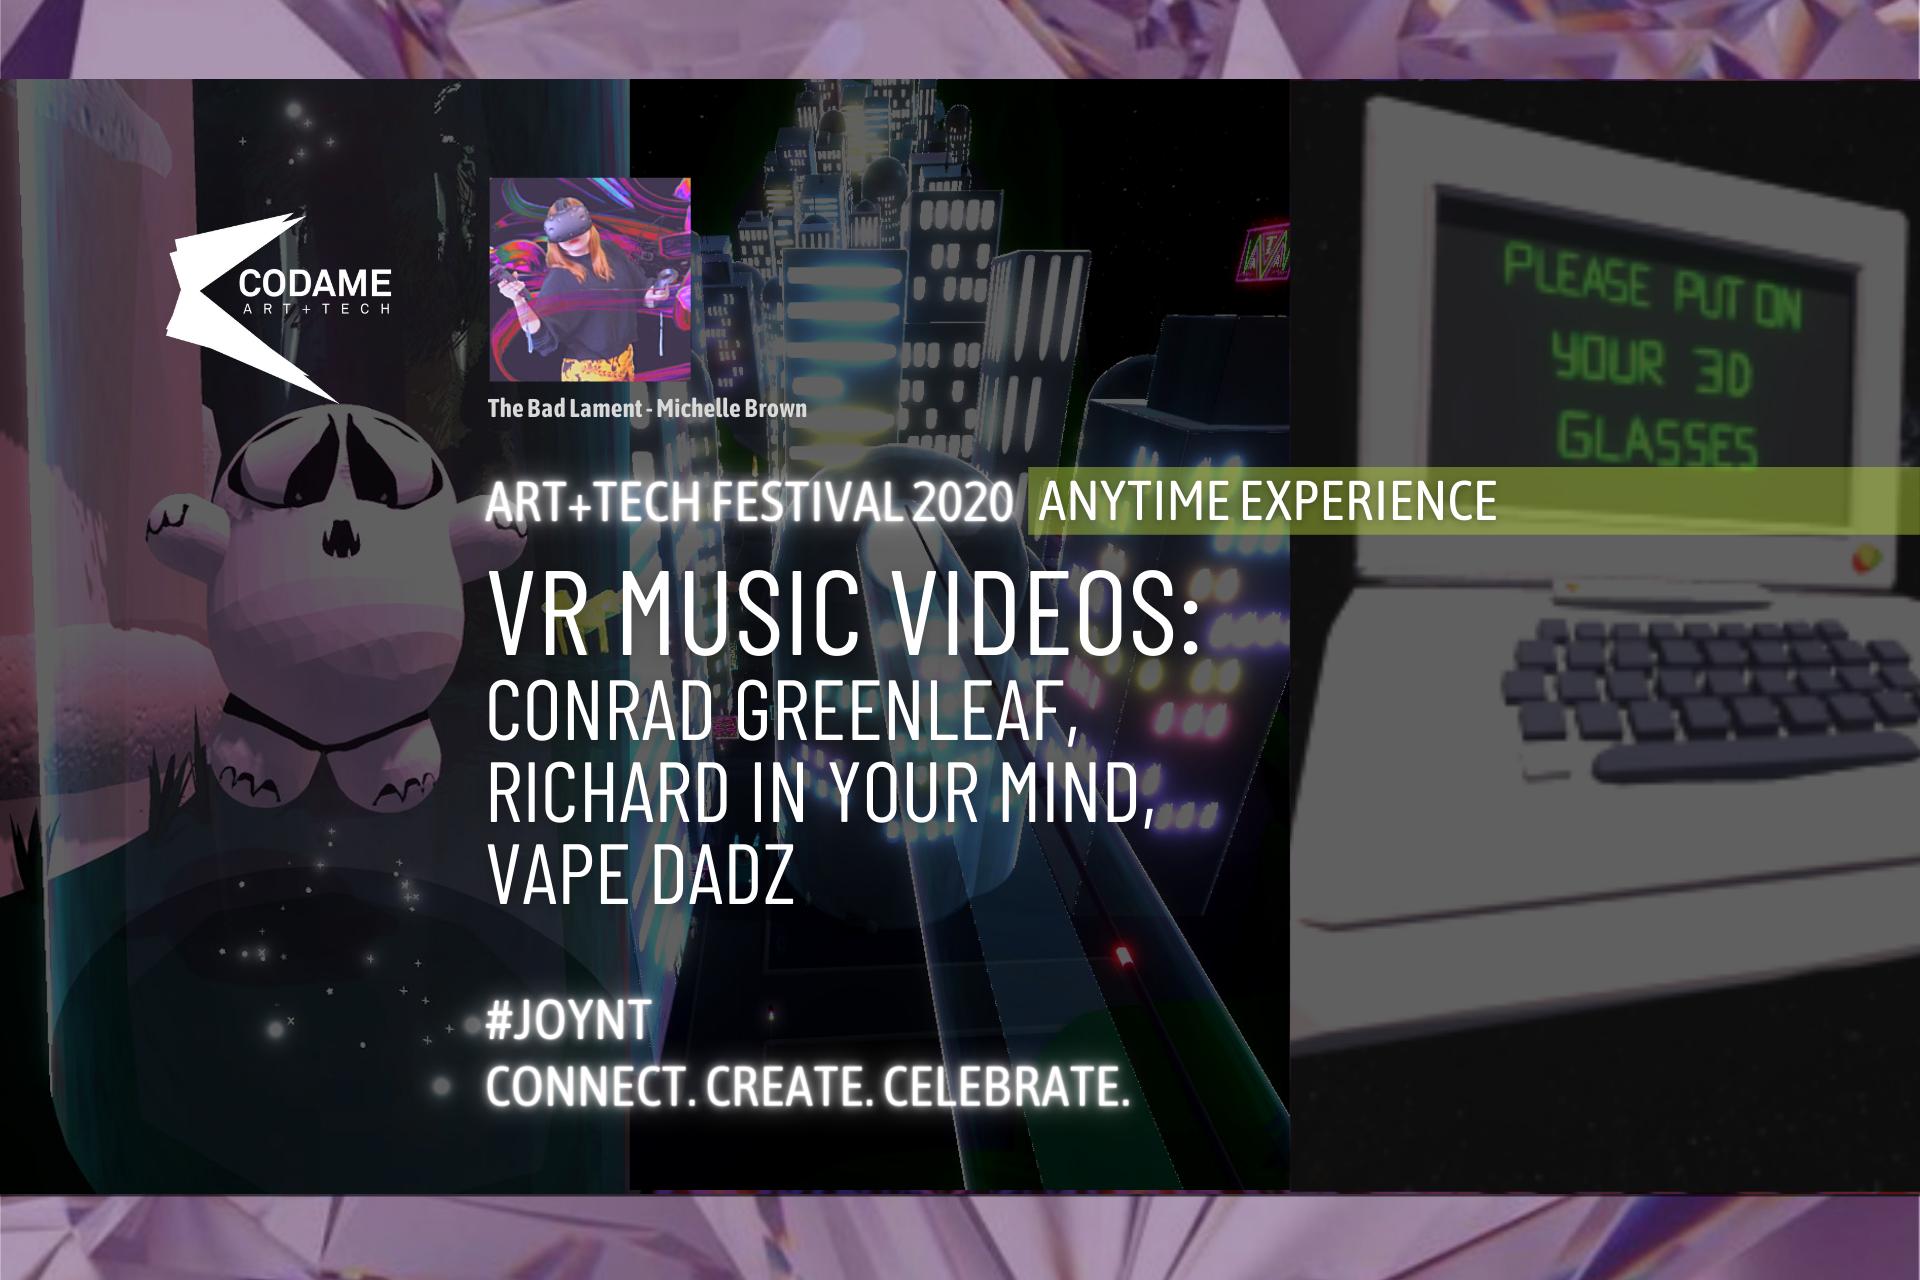 VR Music Videos